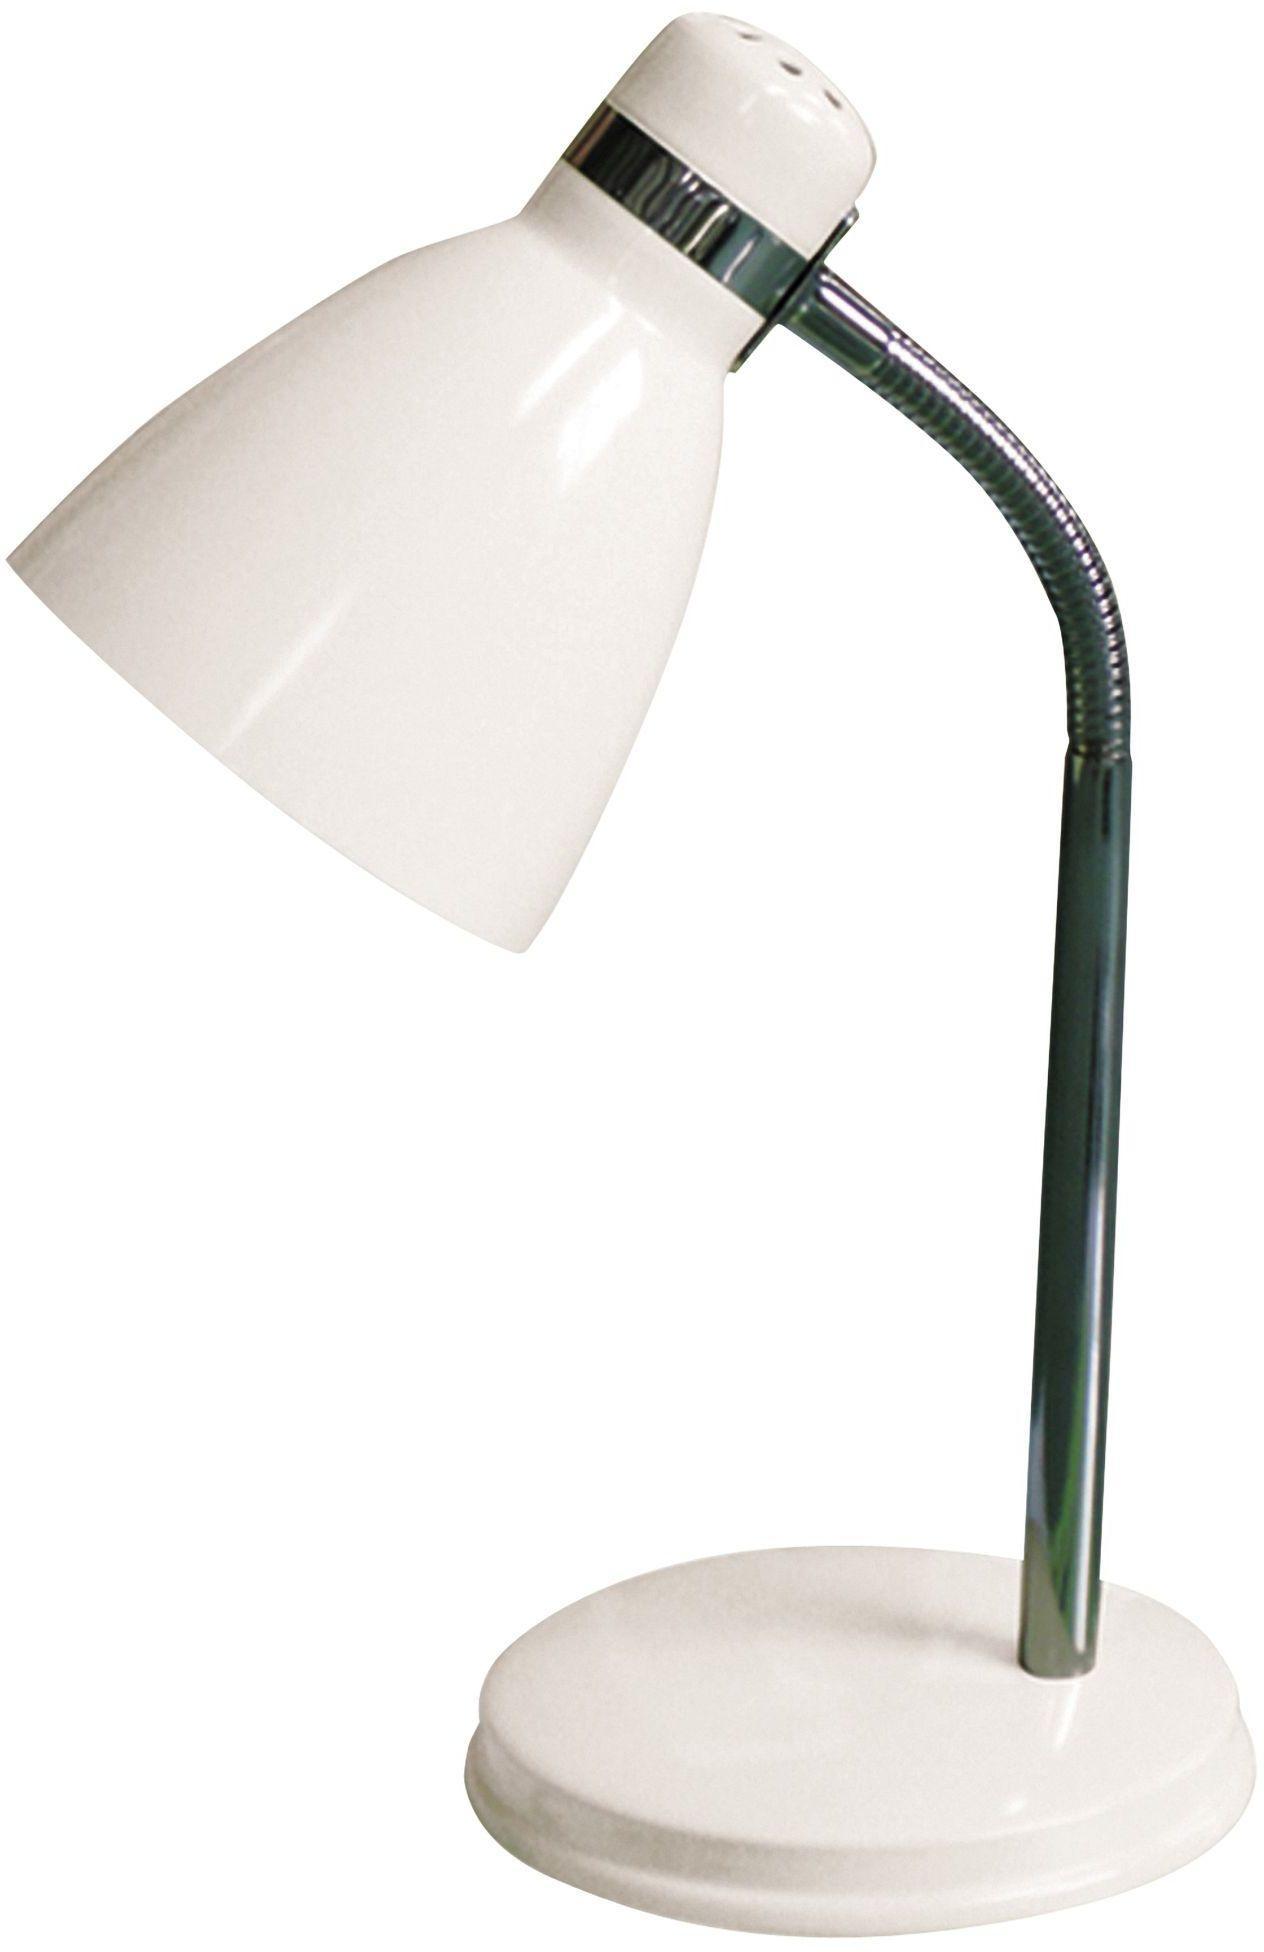 Stojanová lampa Patric 4205 (biela + chrómová)